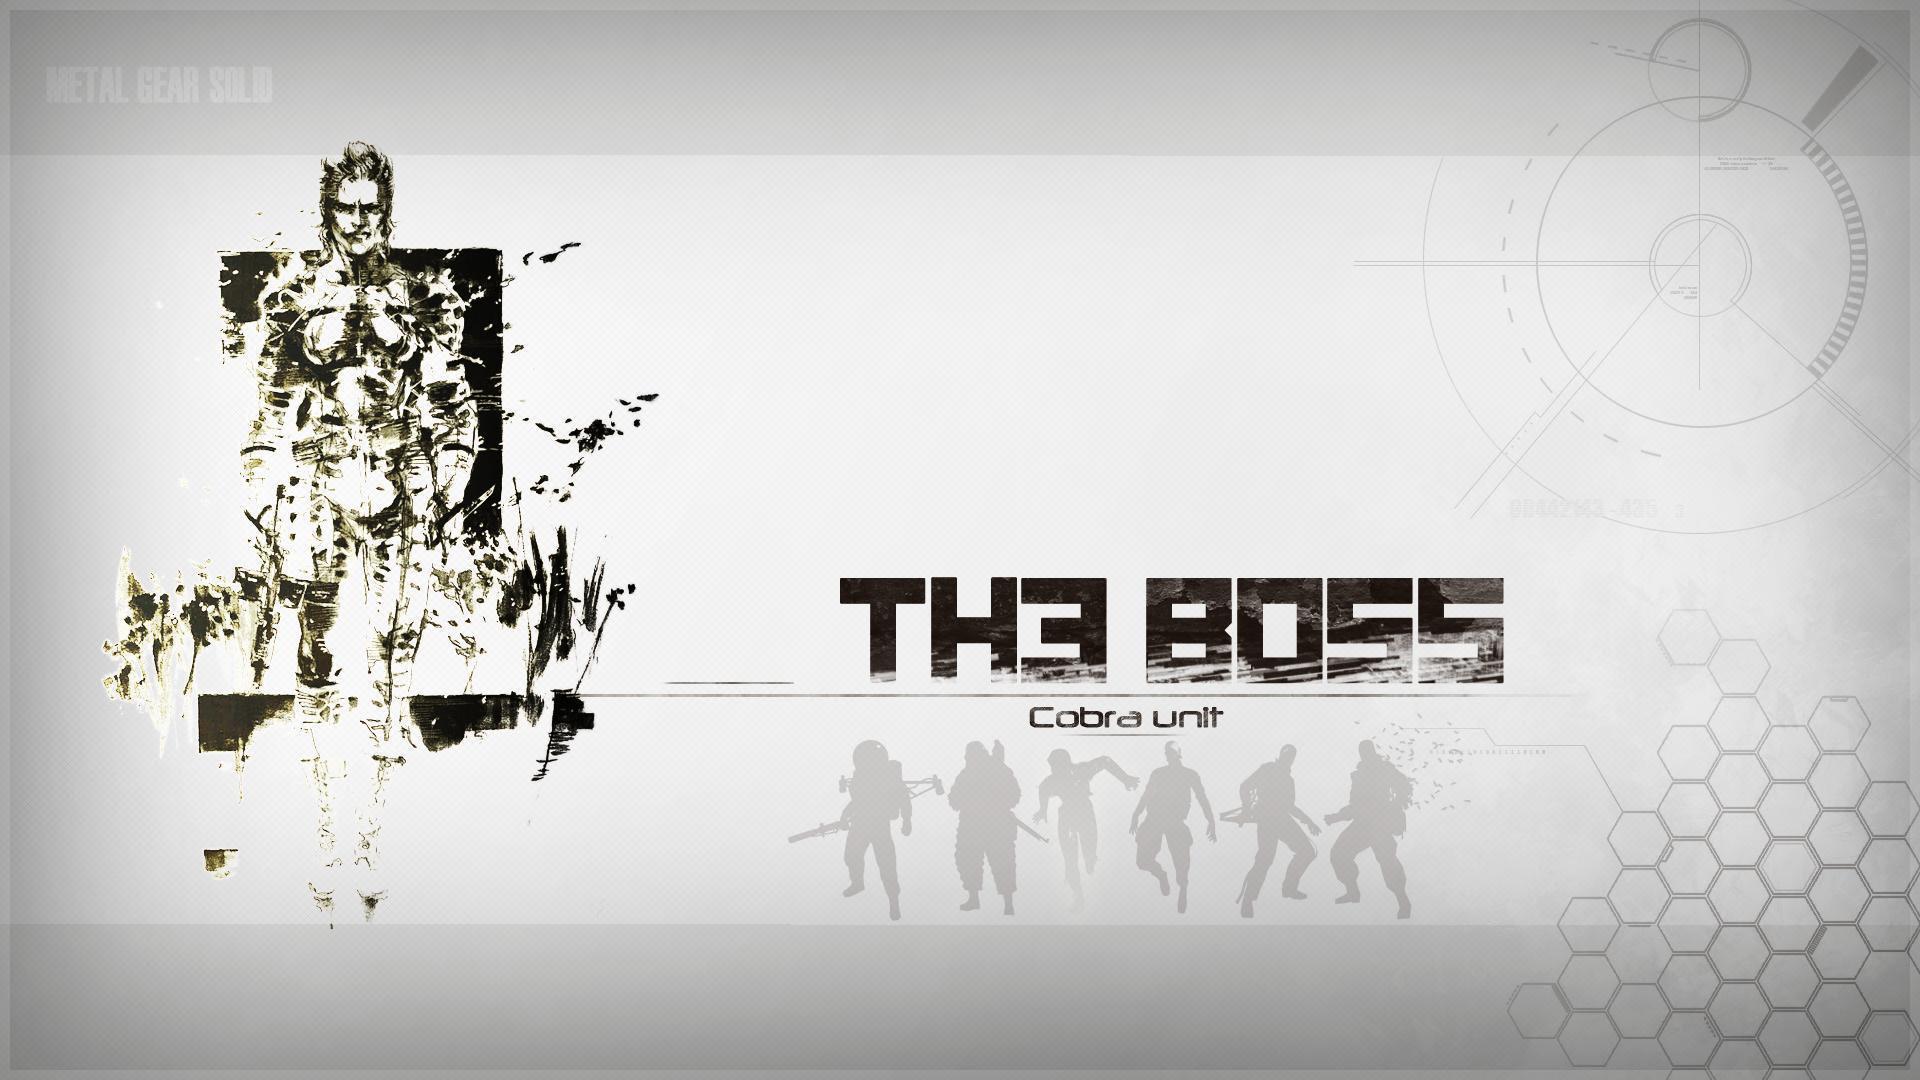 Hd The Boss Metal Gear Solid Wallpaper Download Free 149846